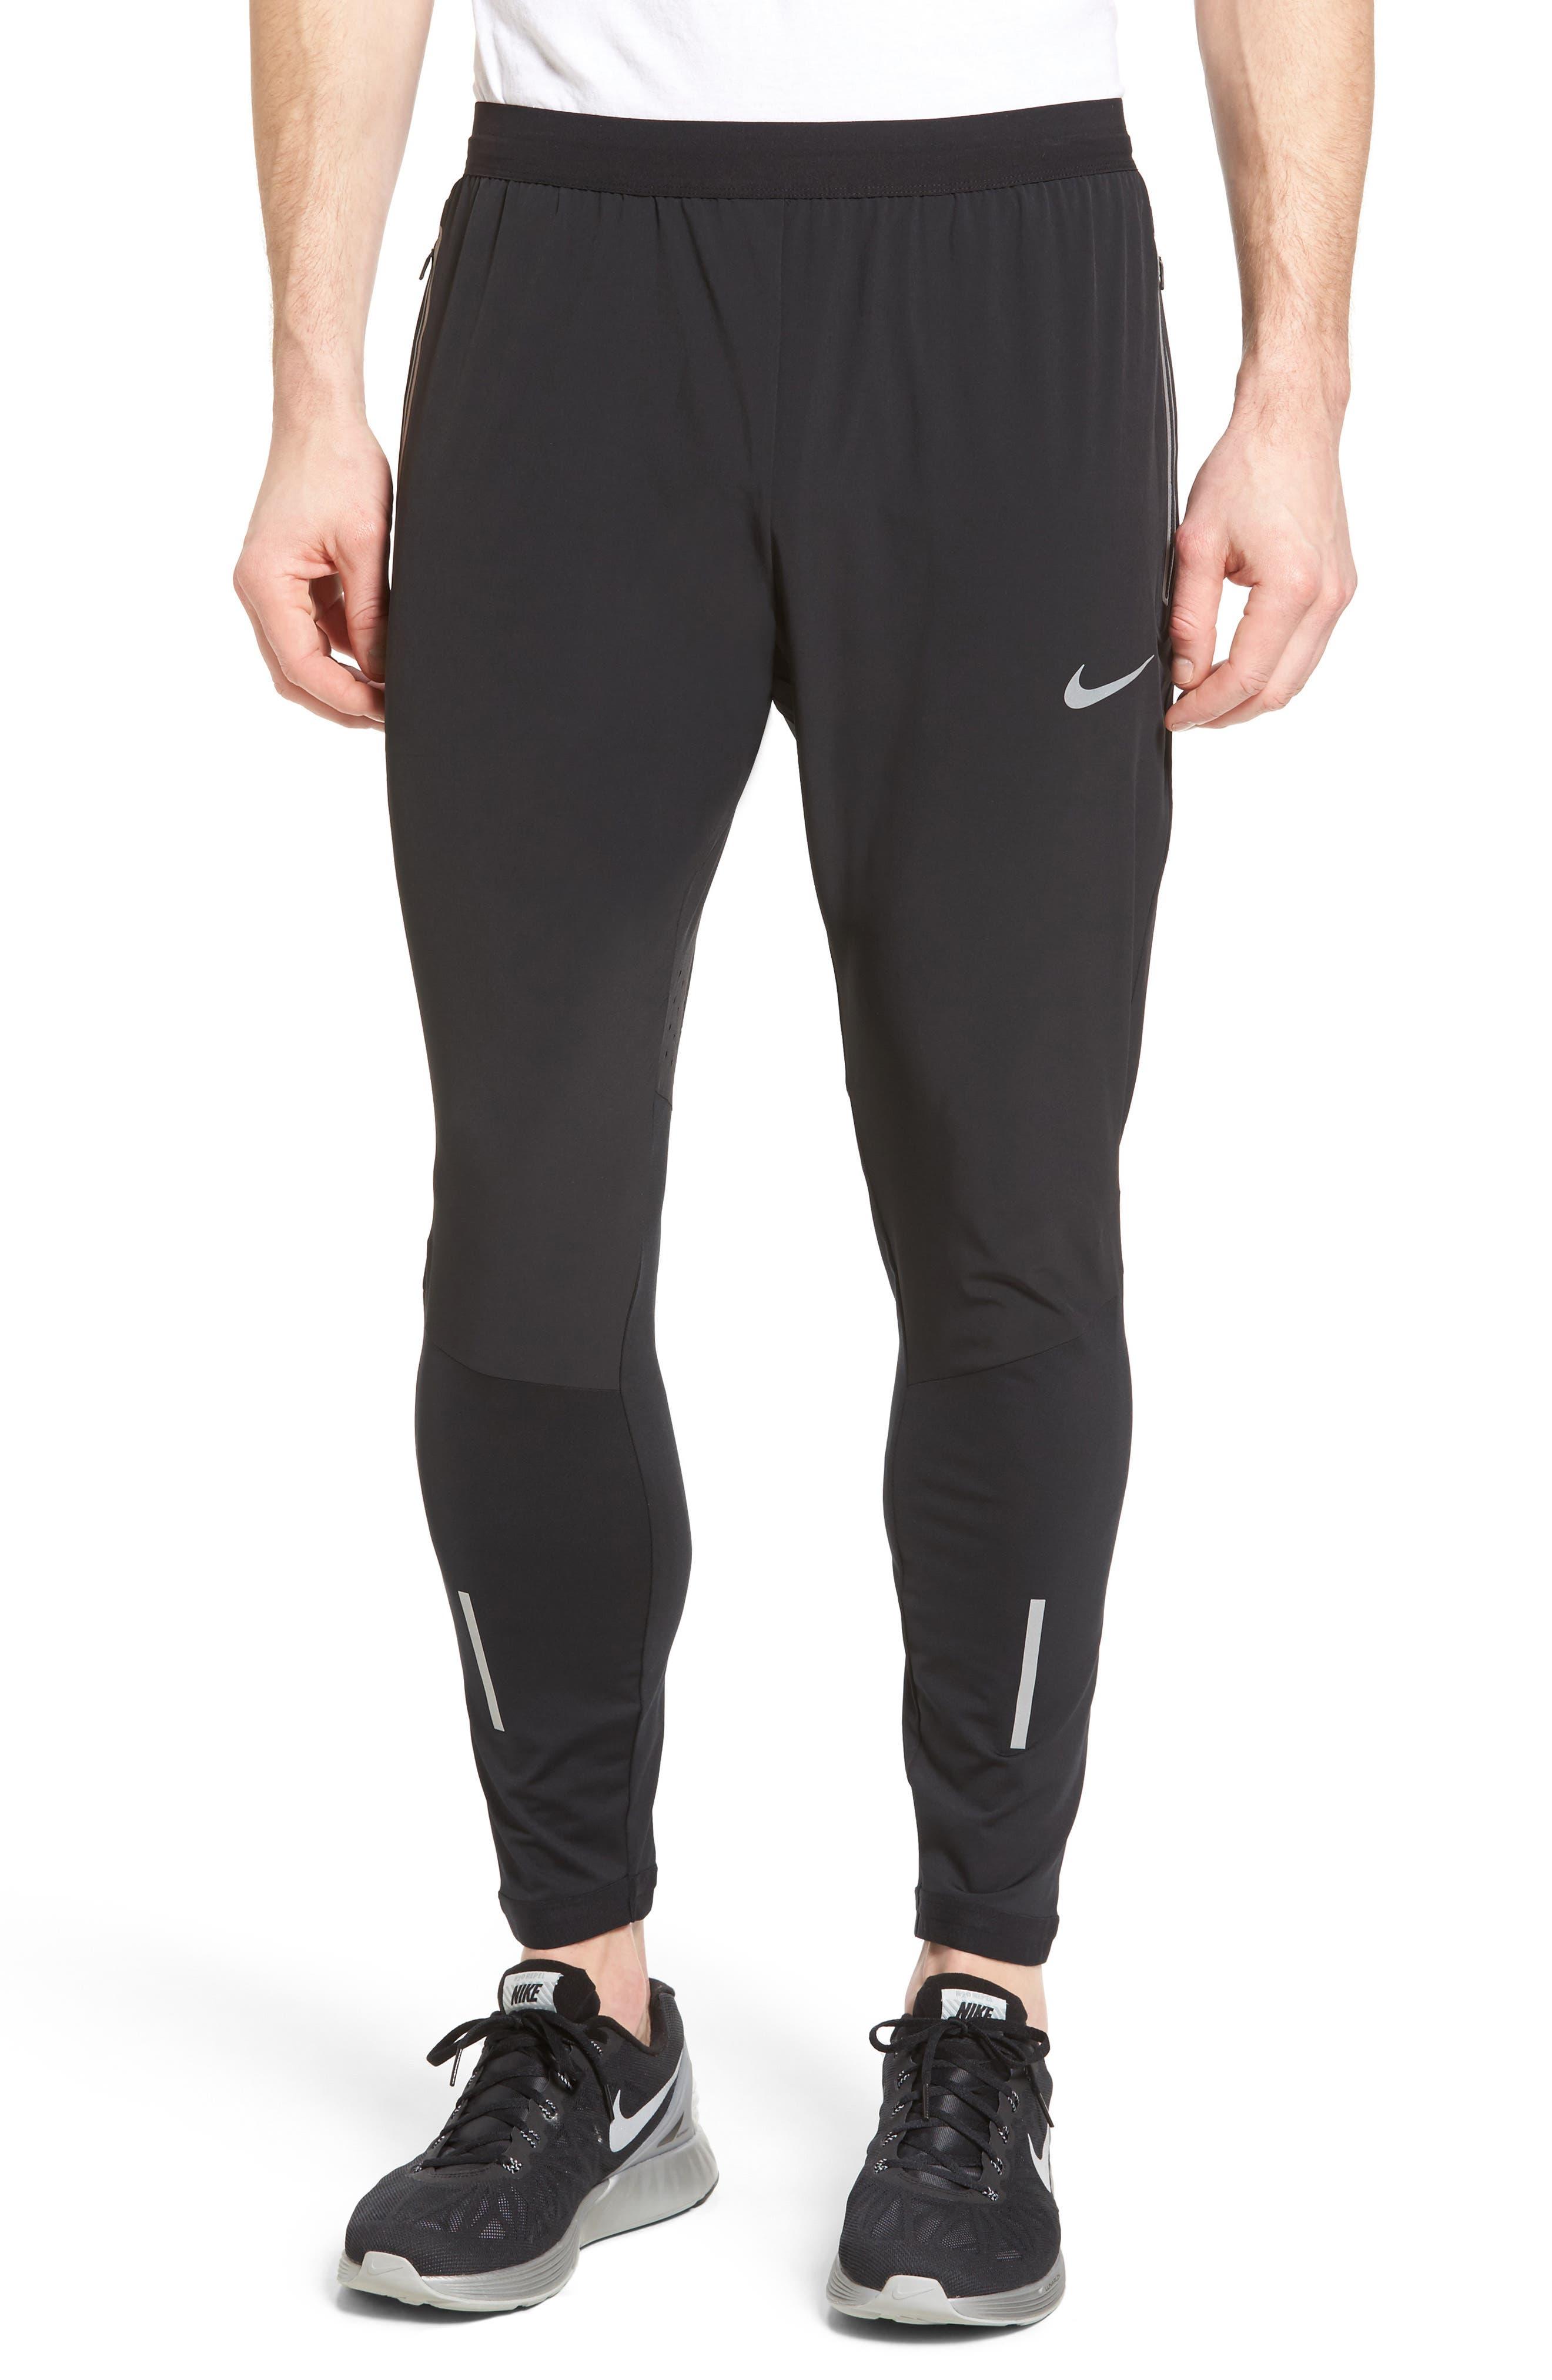 Alternate Image 1 Selected - Nike Flex Running Pants